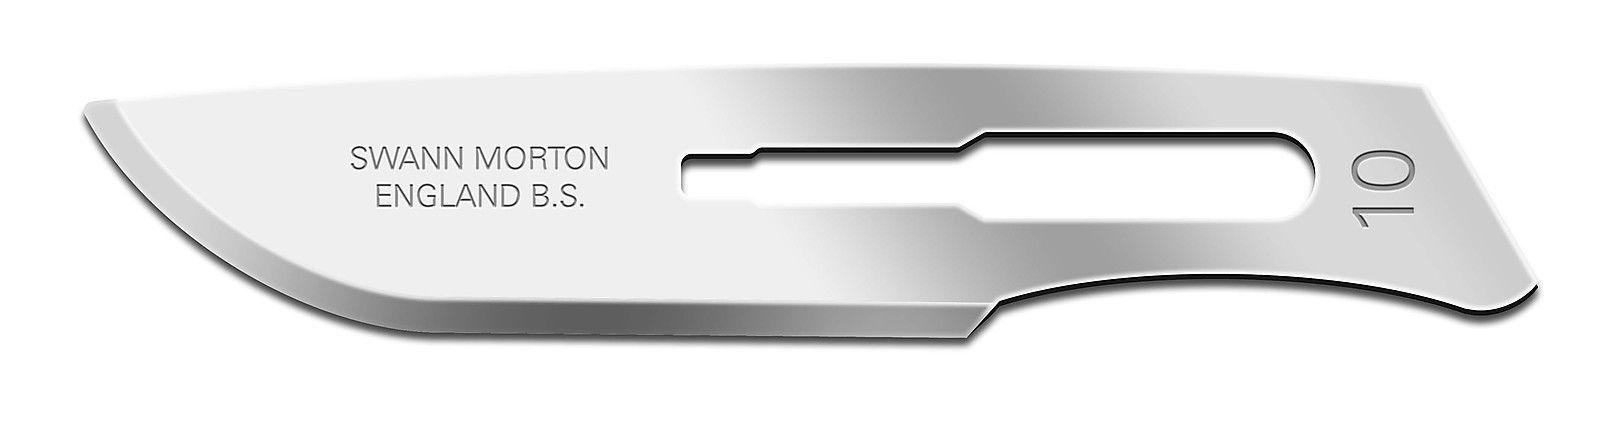 Swann Morton Scalpel Blades Non Sterile Surgical /& Craft Blades Blue Box Type